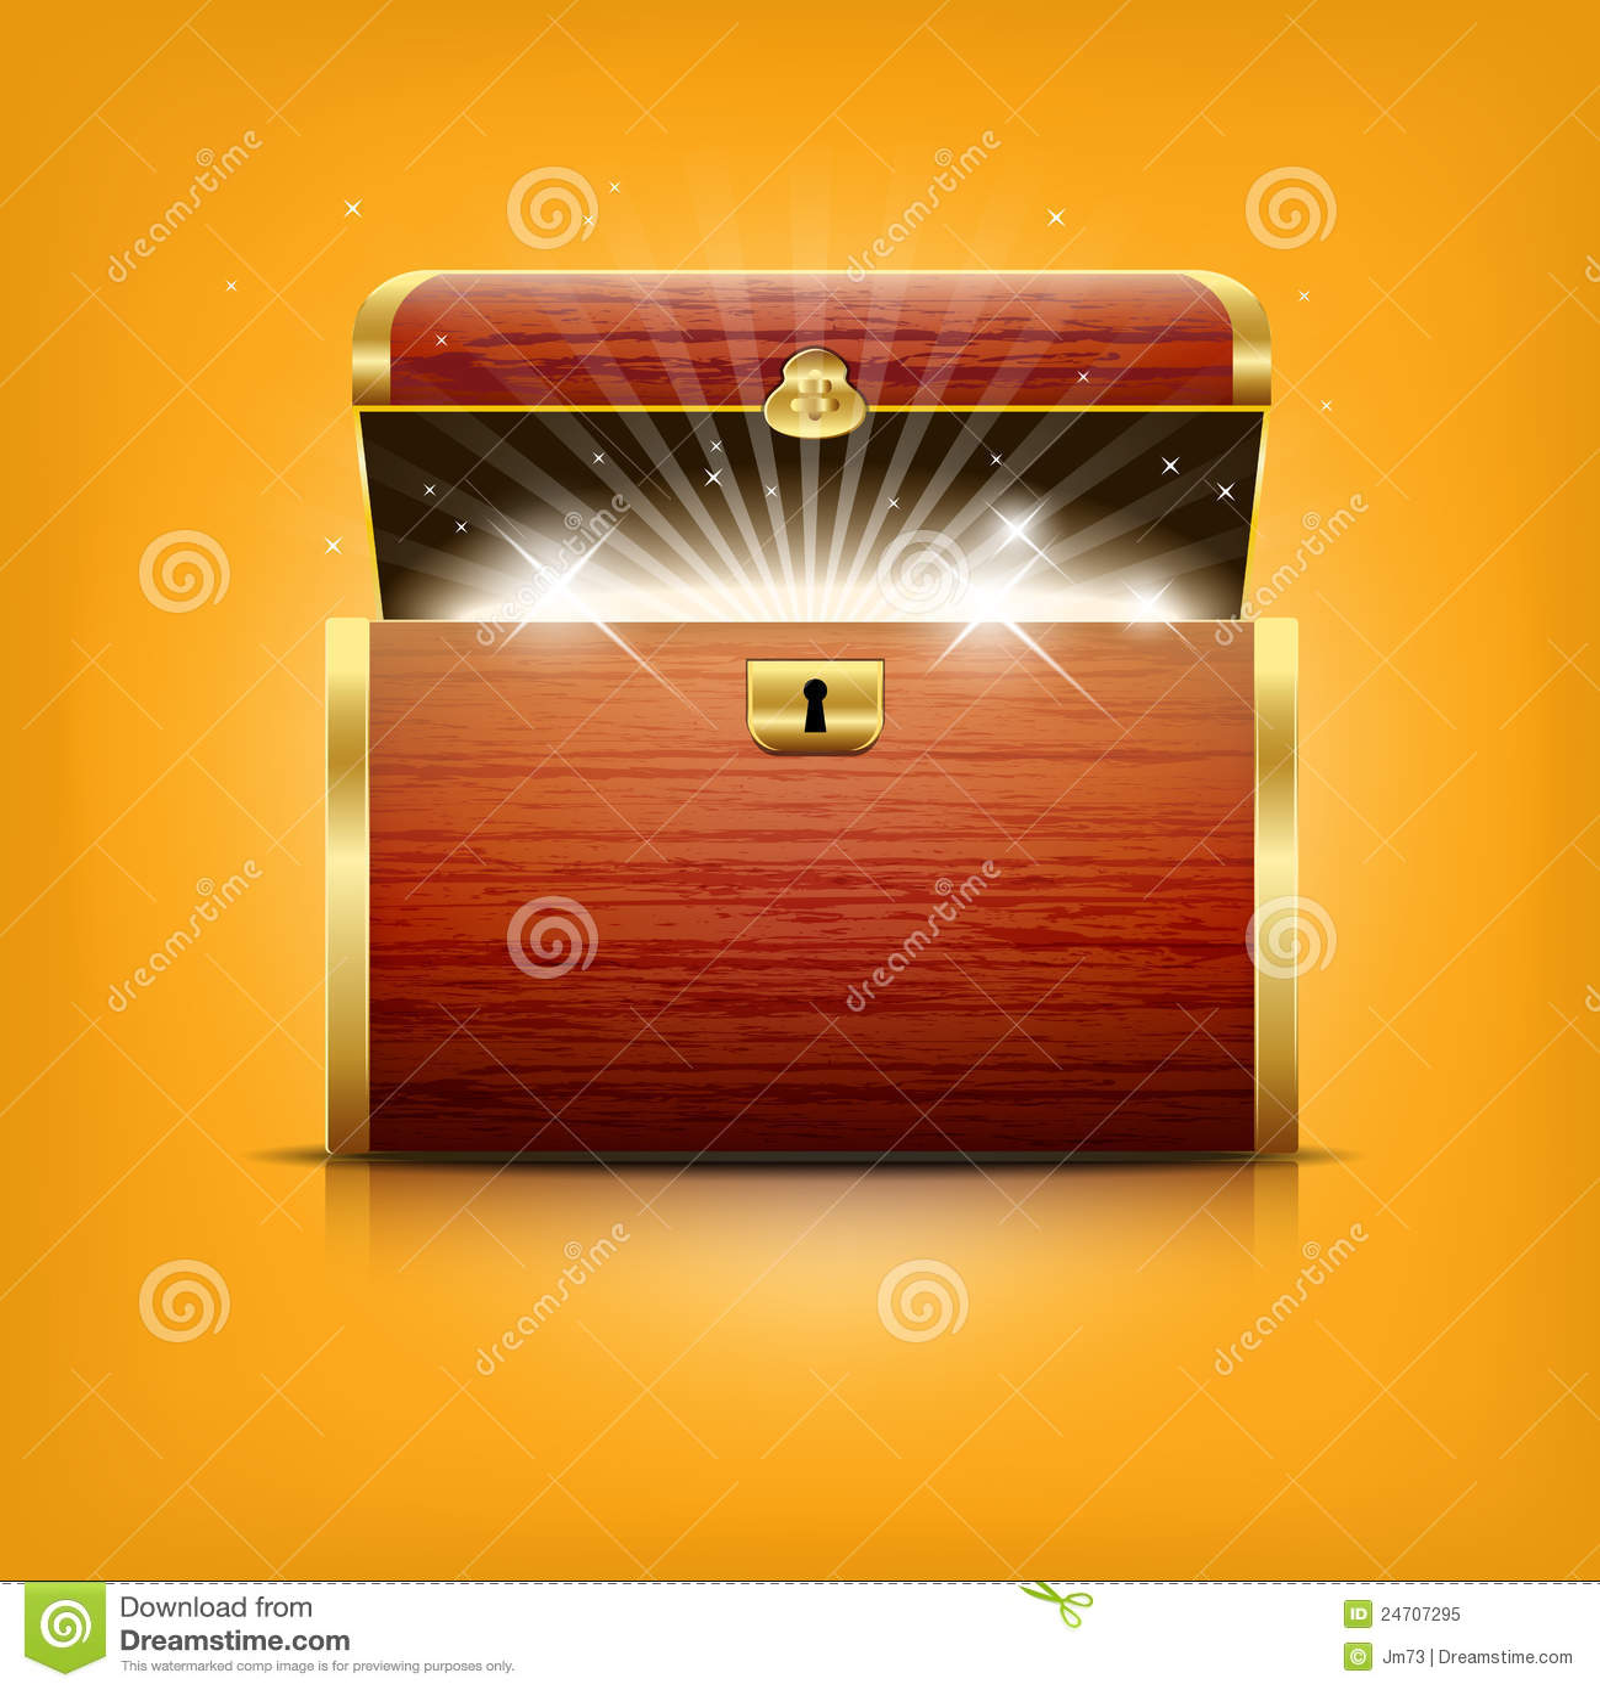 Diamond Box Xl >> Chest With Glowing Treasure Stock Vector - Illustration of object, treasure: 24707295